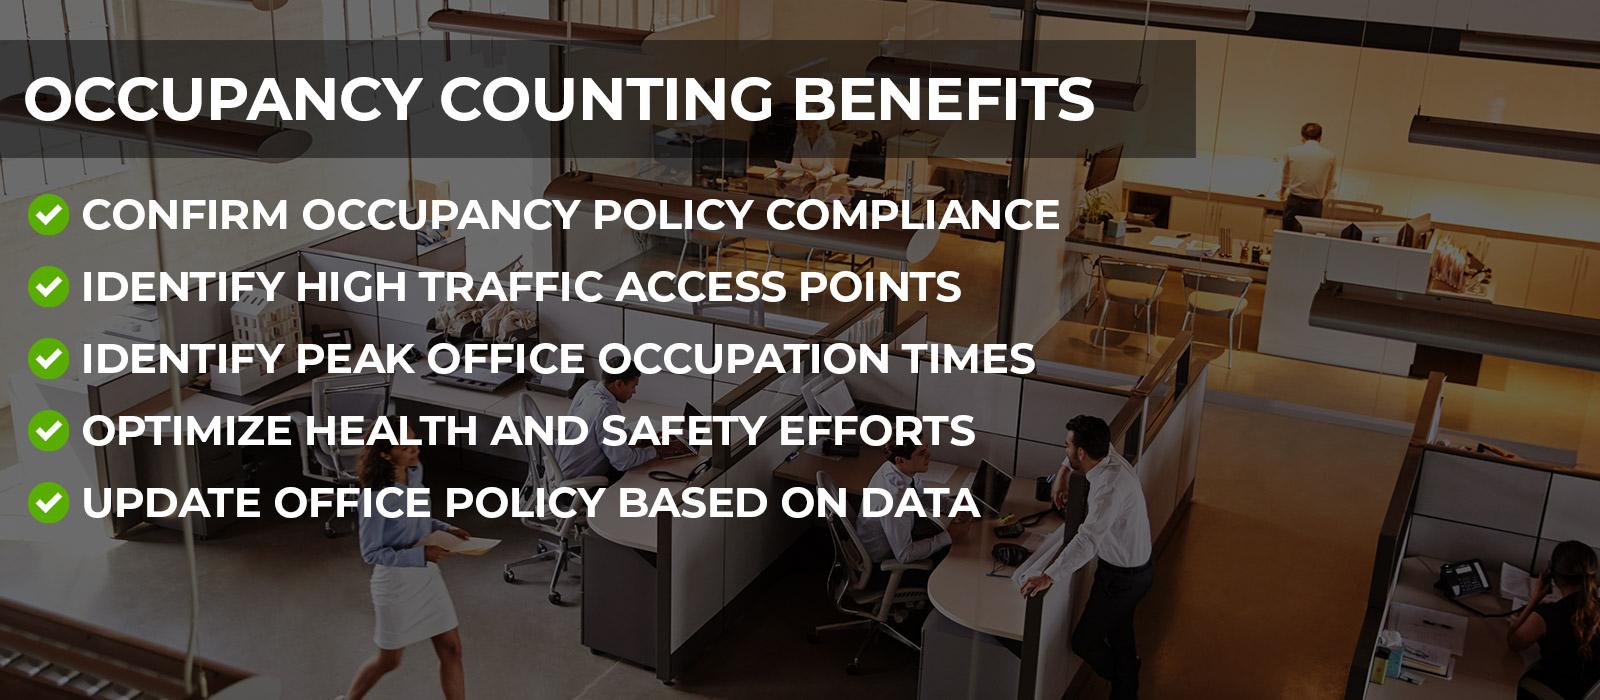 CRV Surveillance - Occupancy Counting Benefits